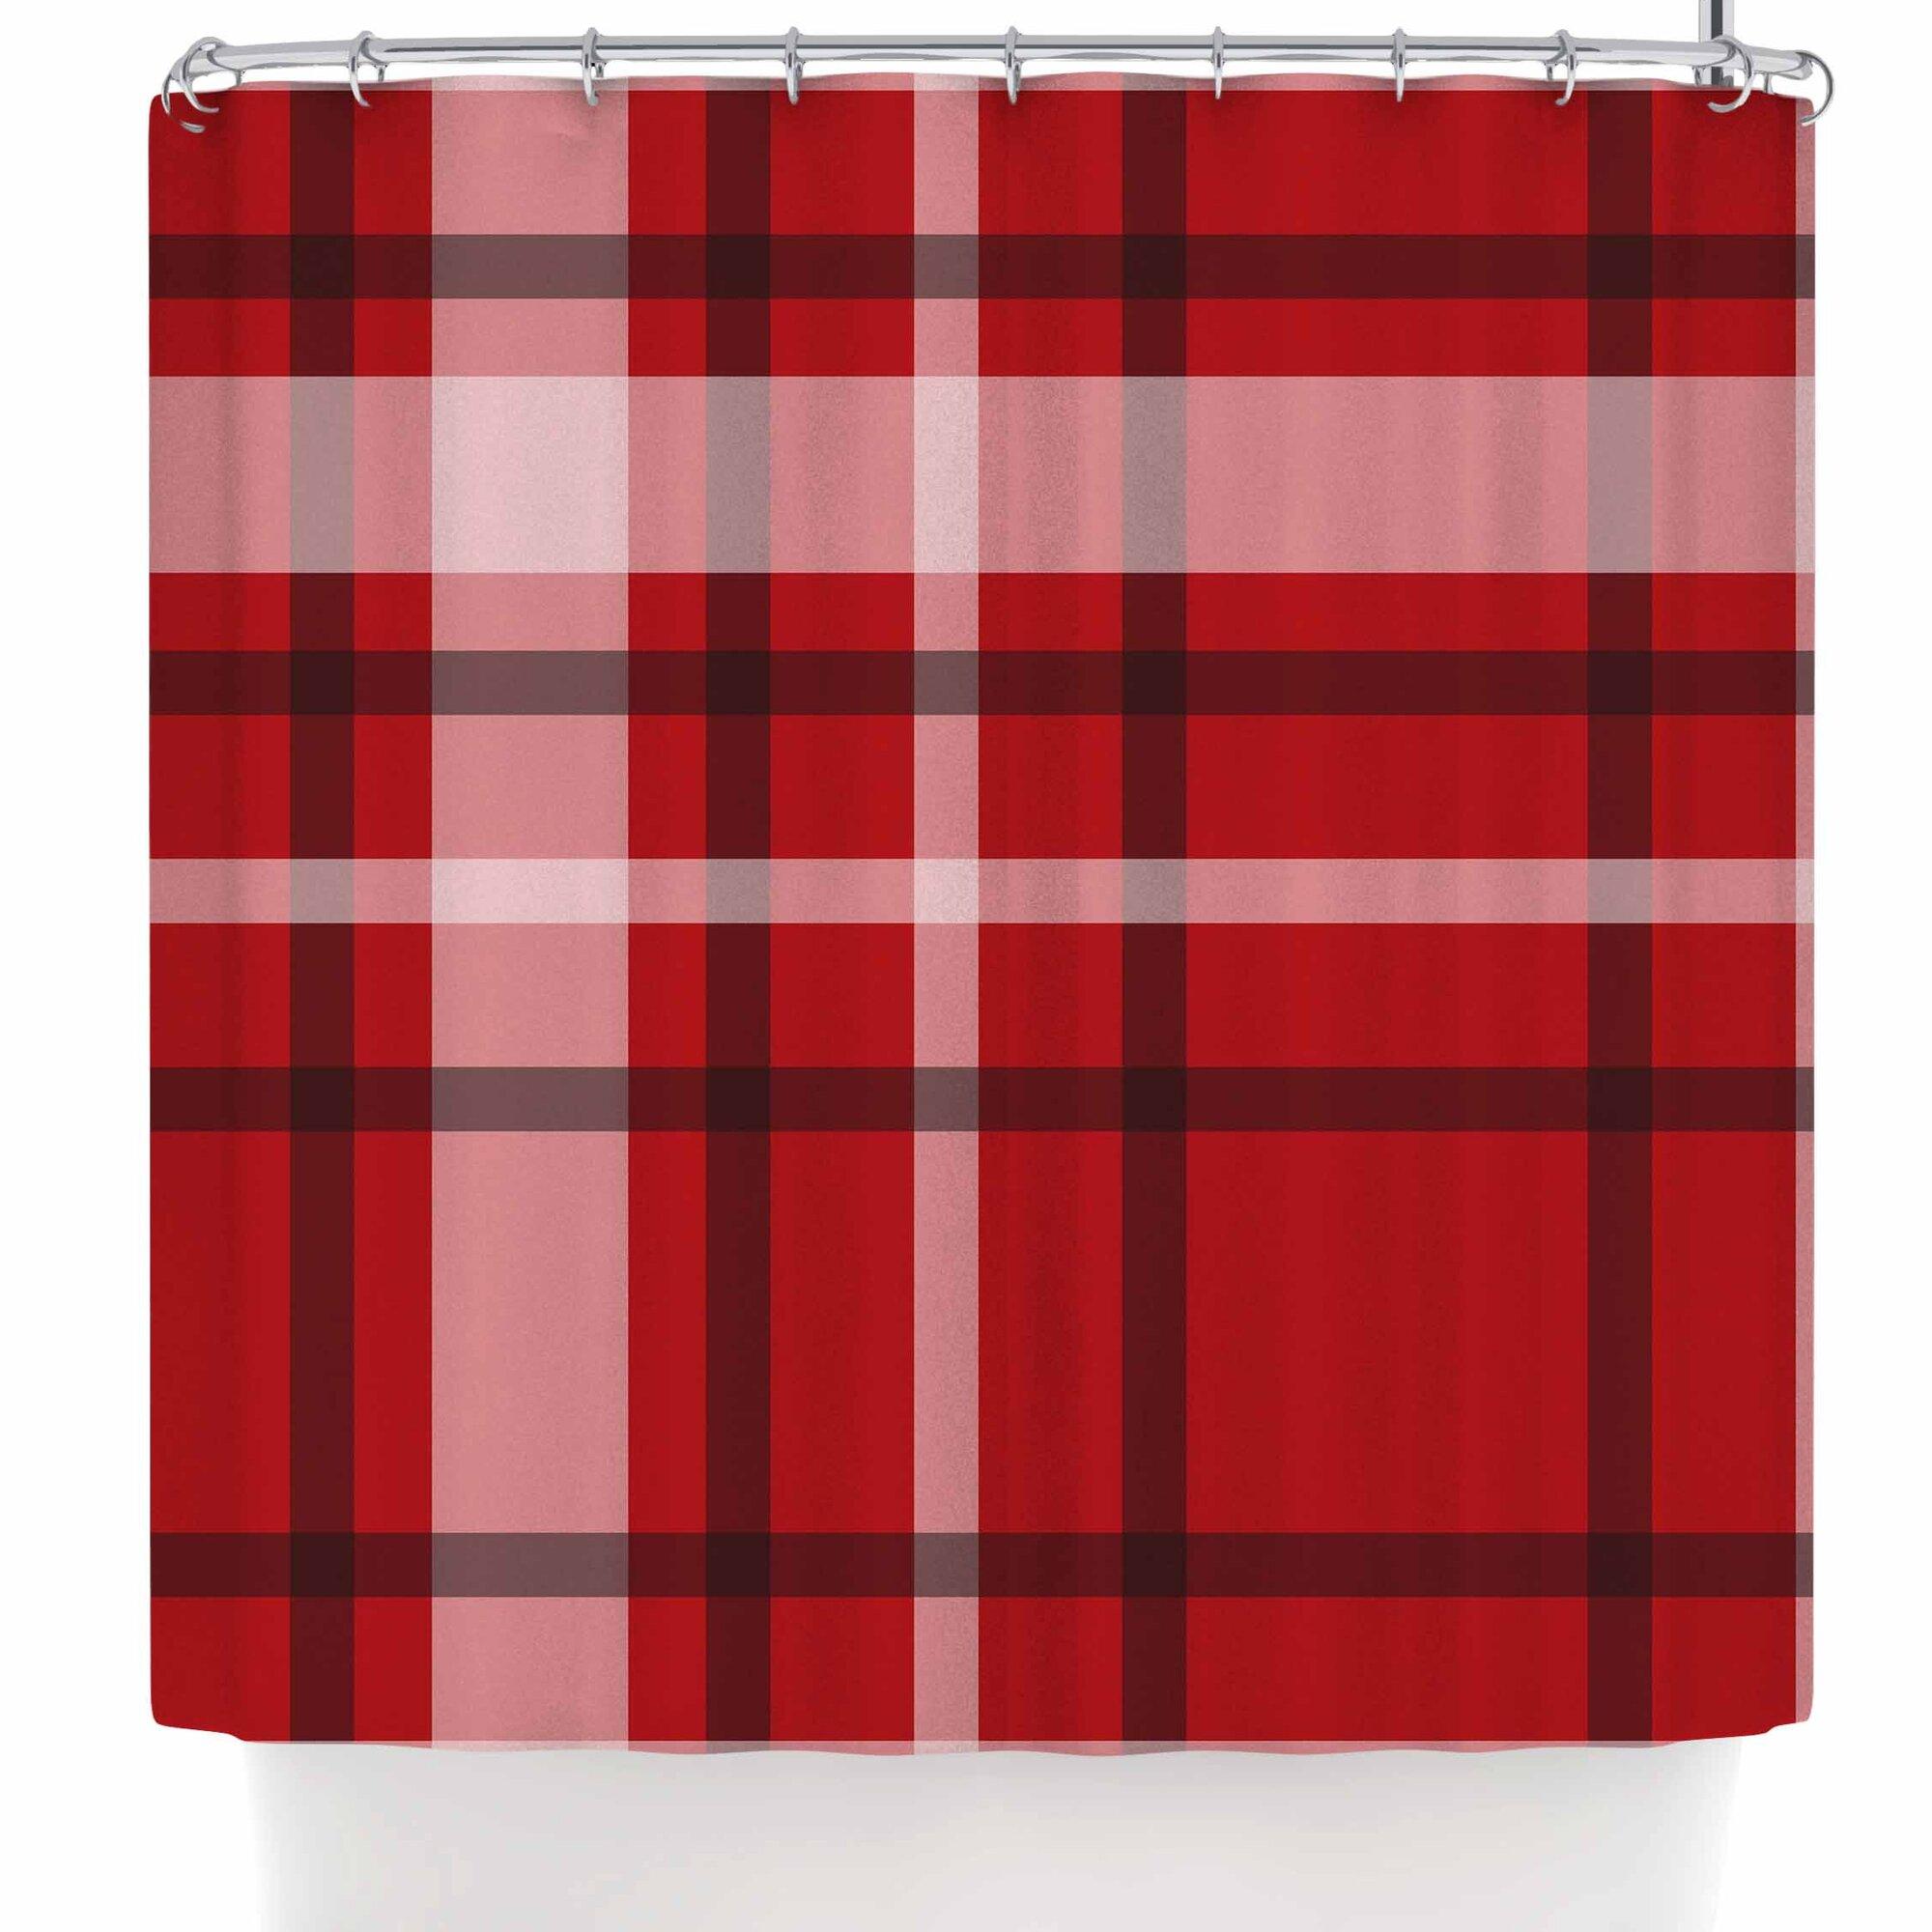 Famenxt Plaid Red Shower Curtain